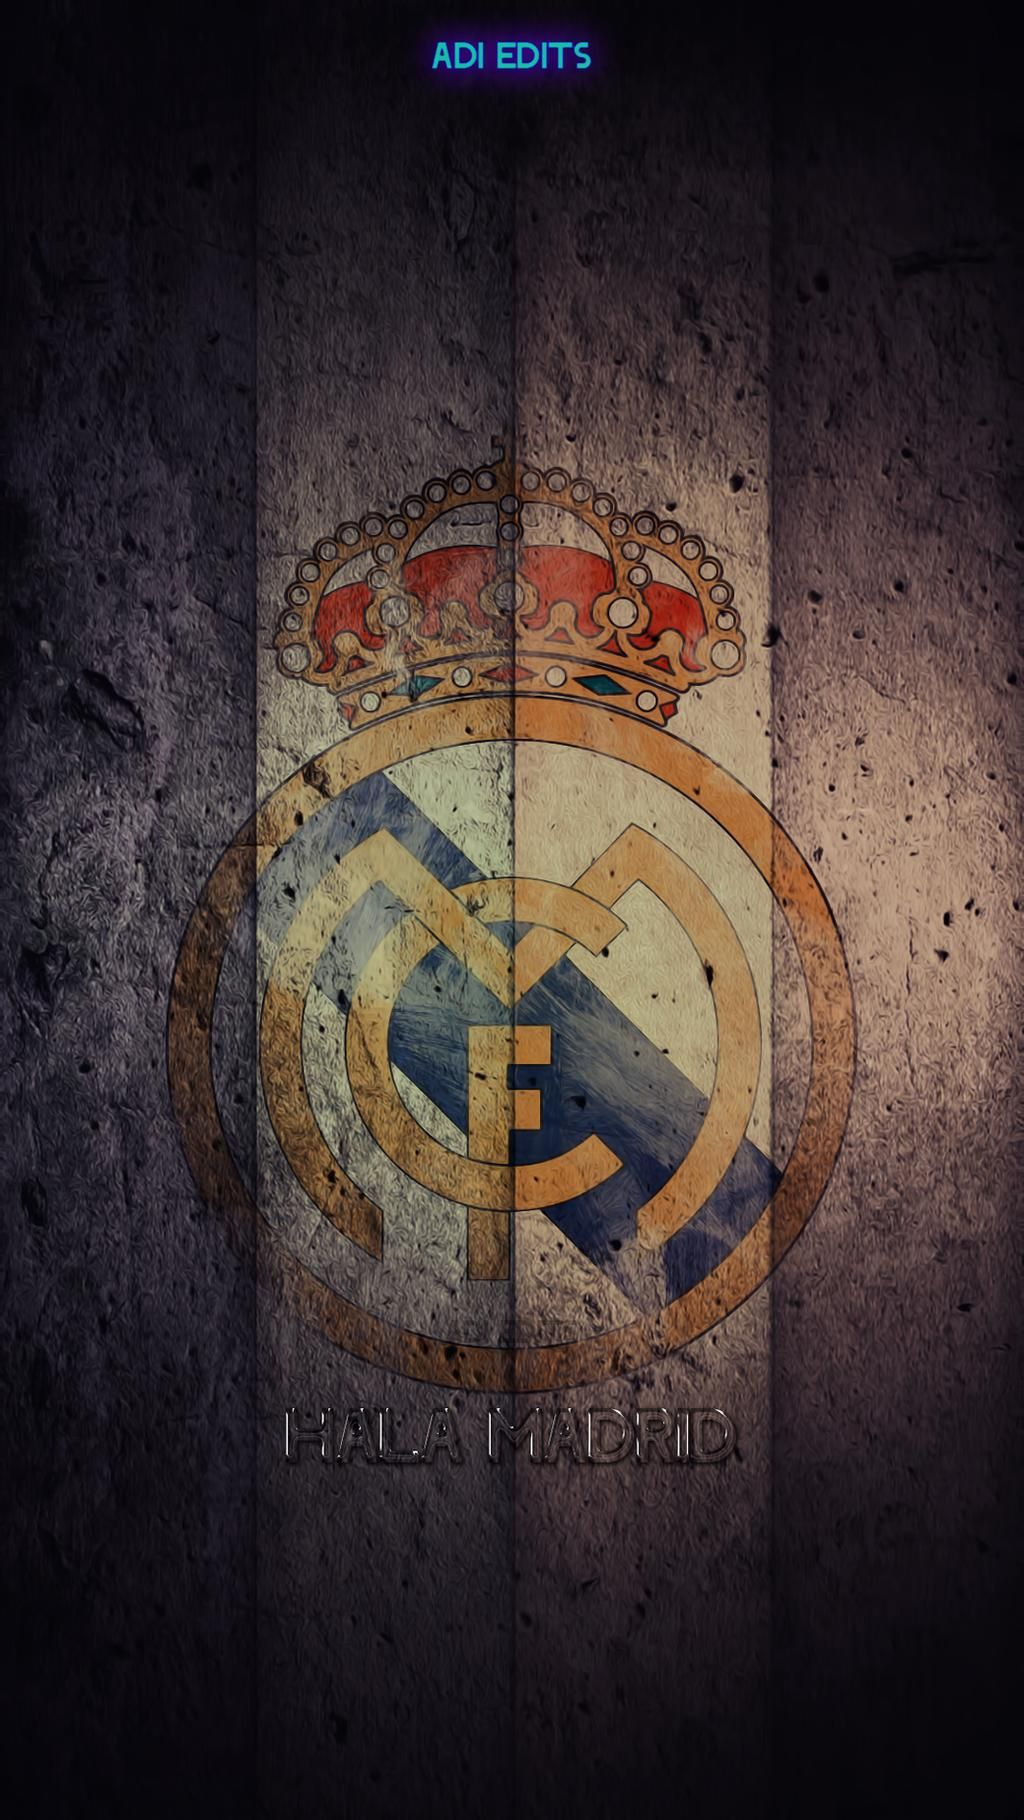 Lock Screen Real Madrid Wallpaper Iphone - Hd Football in ...